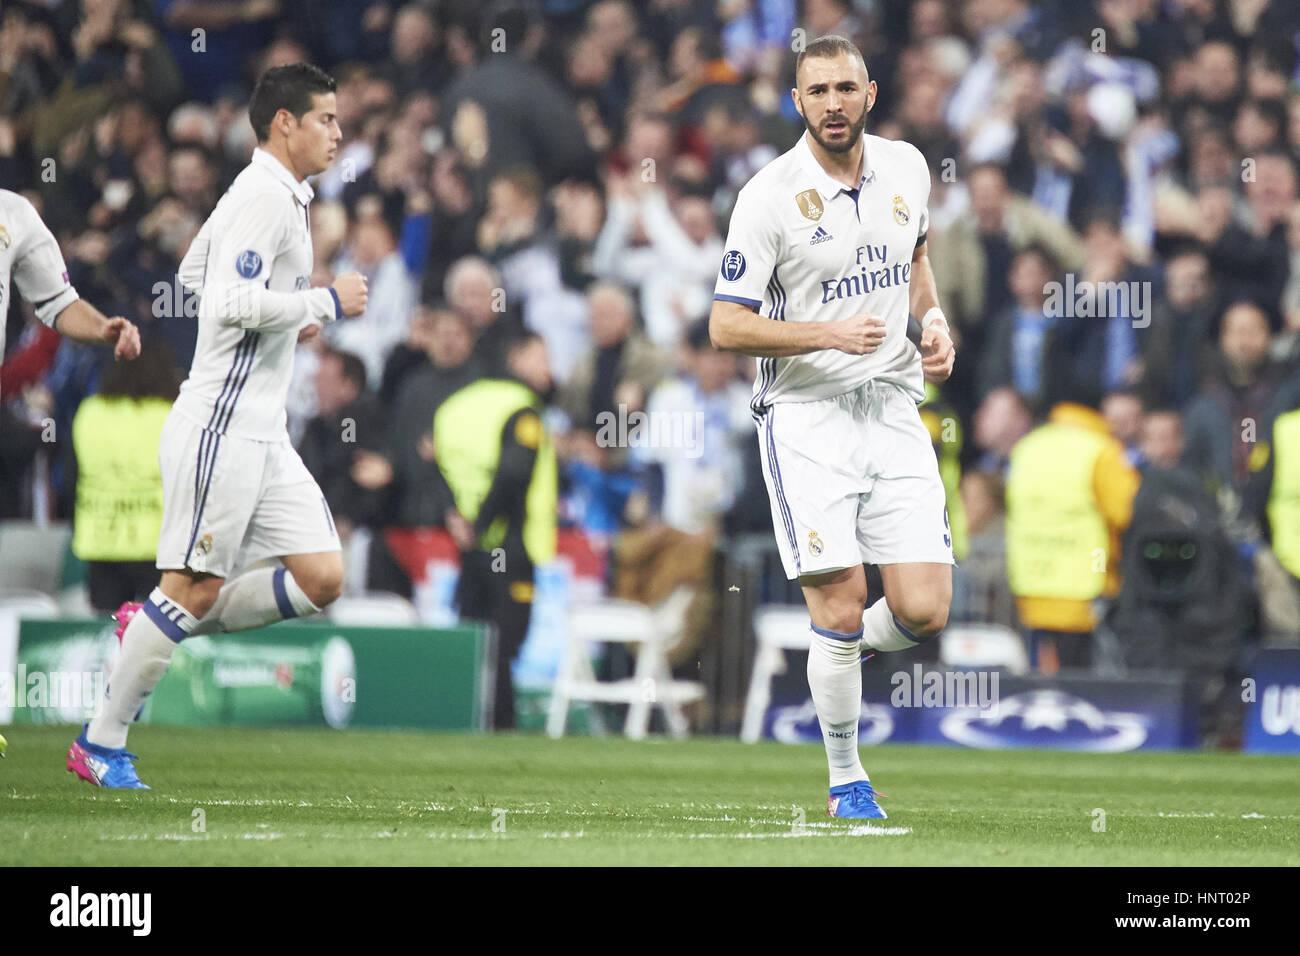 8131dc34f Madrid